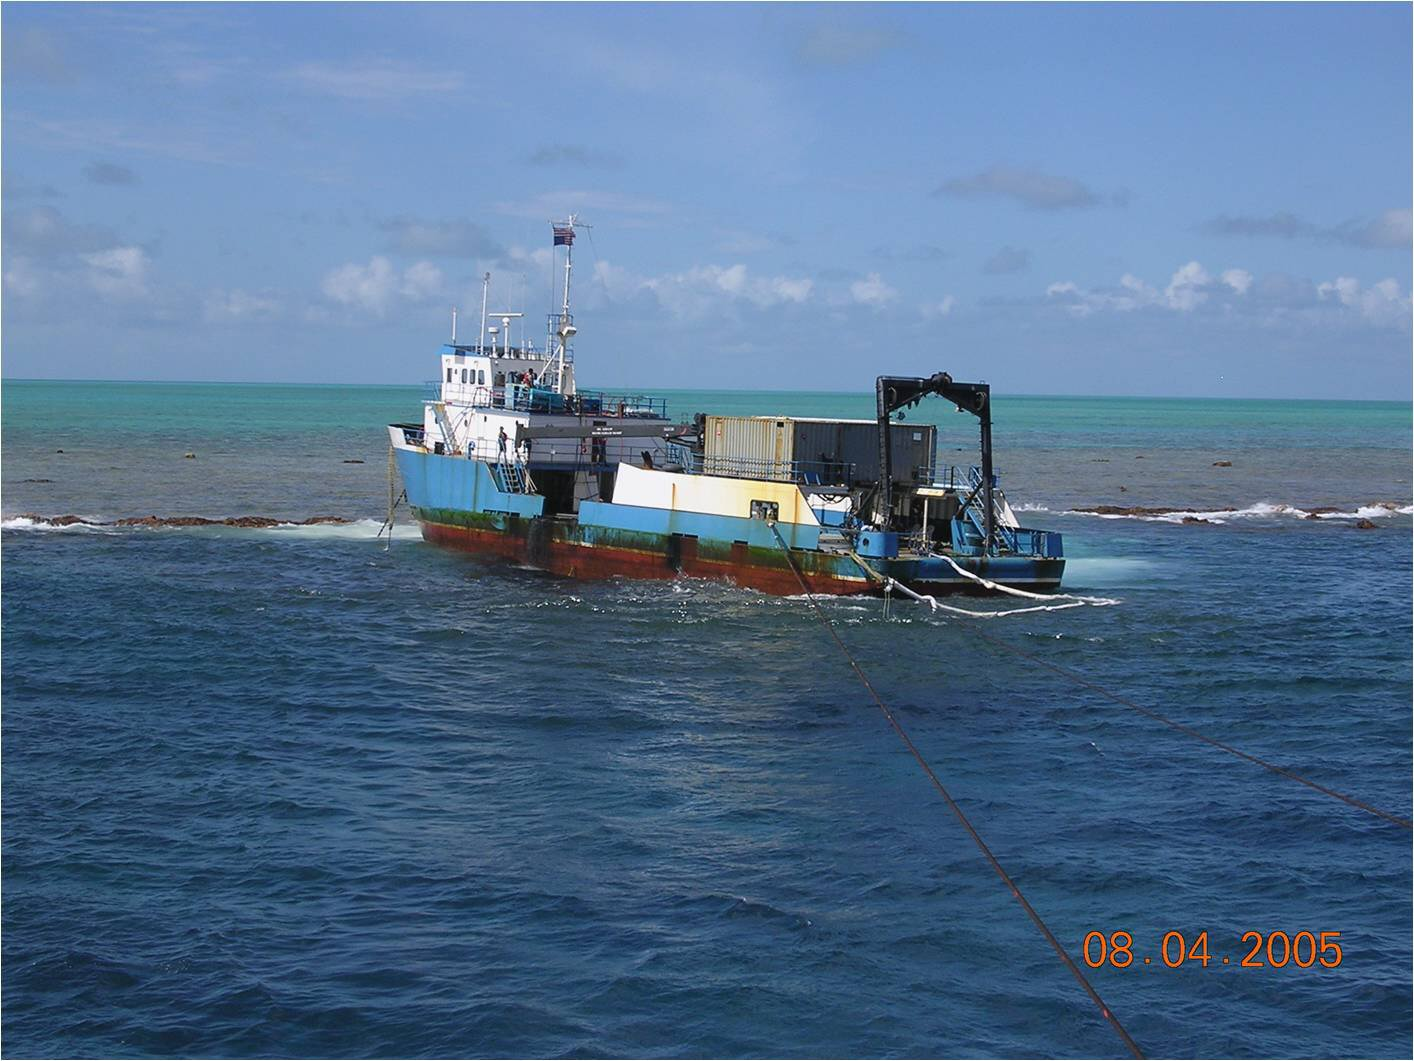 M/V Casitas aground on atoll.